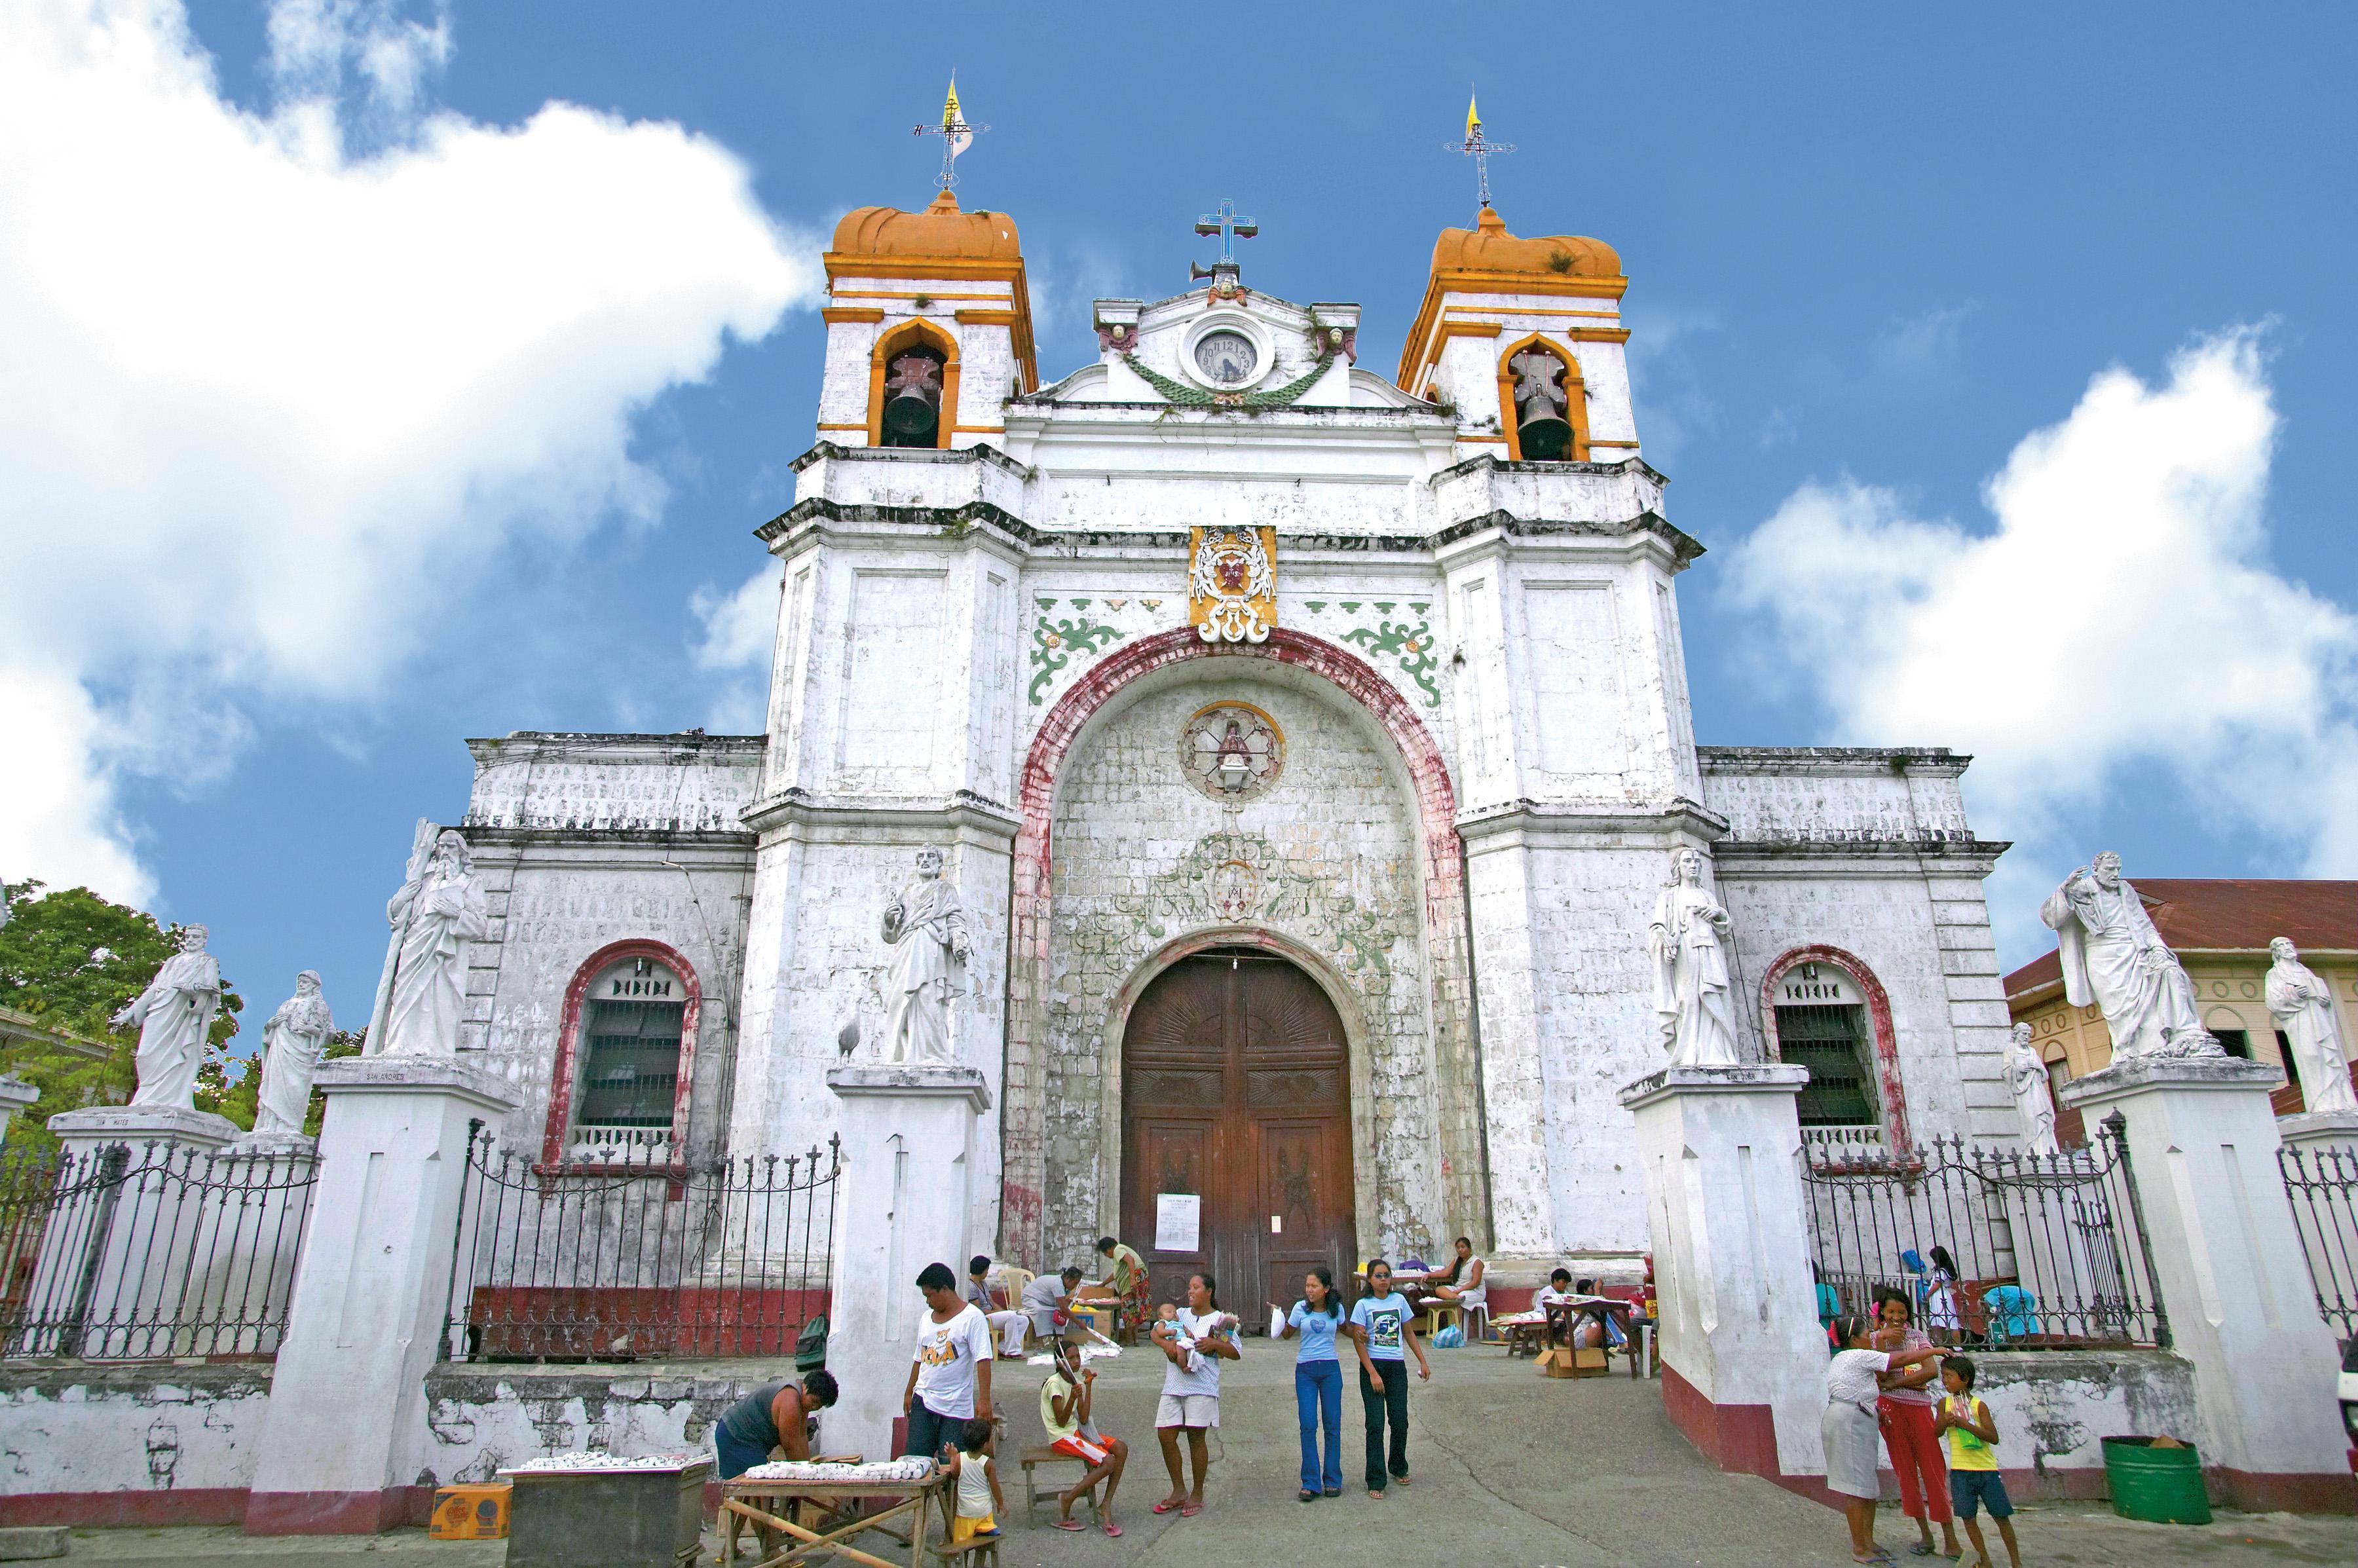 St. Catherine of Alexandria Church of Carcar, Cebu